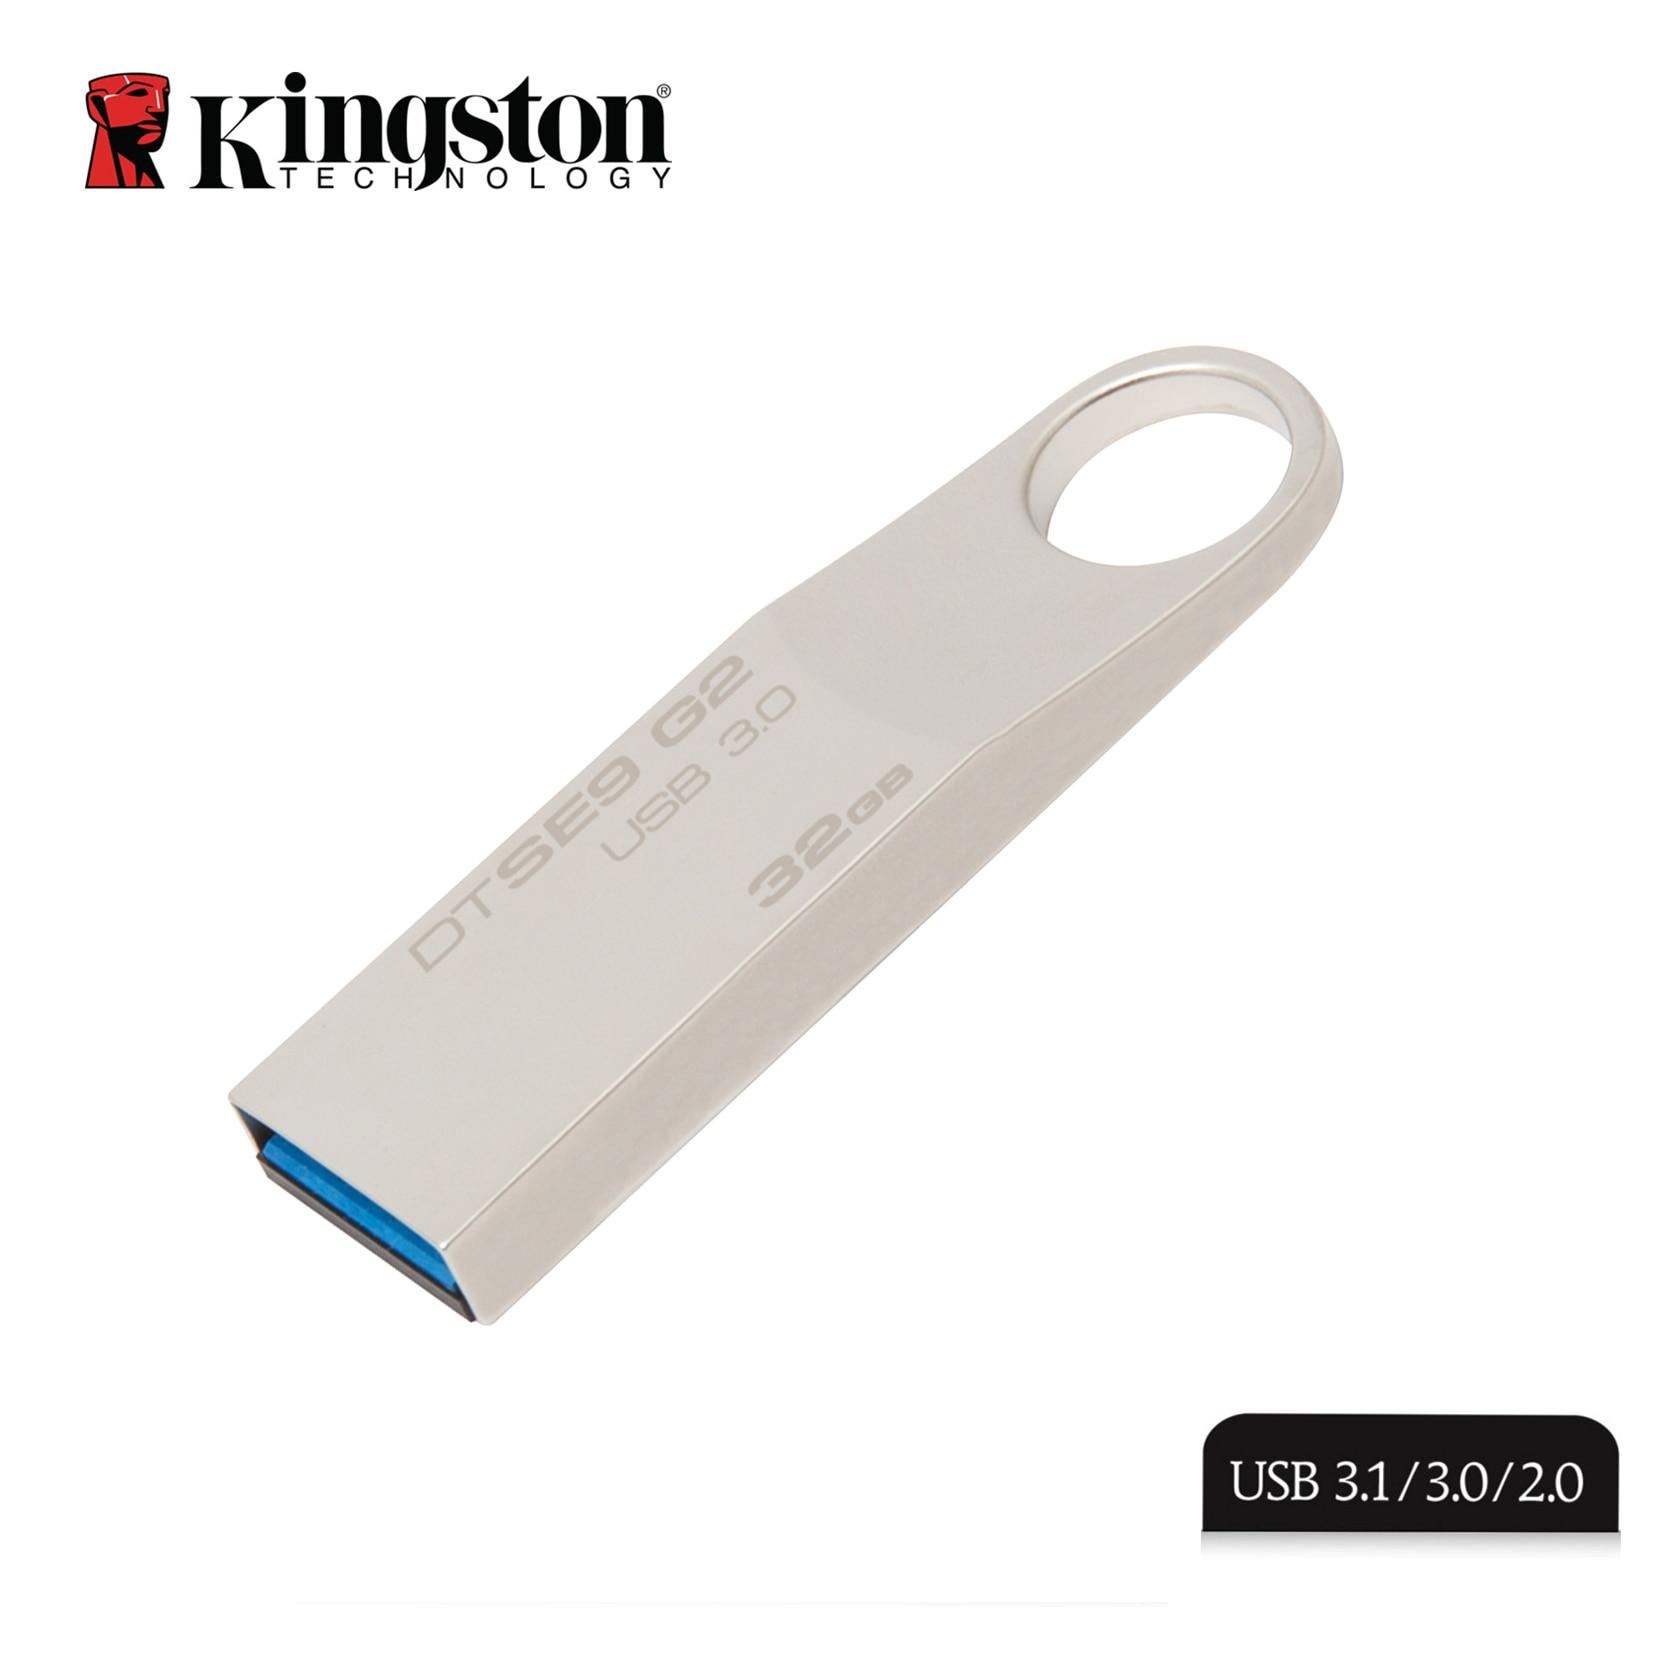 Kingston Usb 3.0 Flash Drive Metal Pen Drive 16gb 32 Gb 64 Gb 128gb Pendrive Flash Memoria Mini Key Caneta Memory Stick